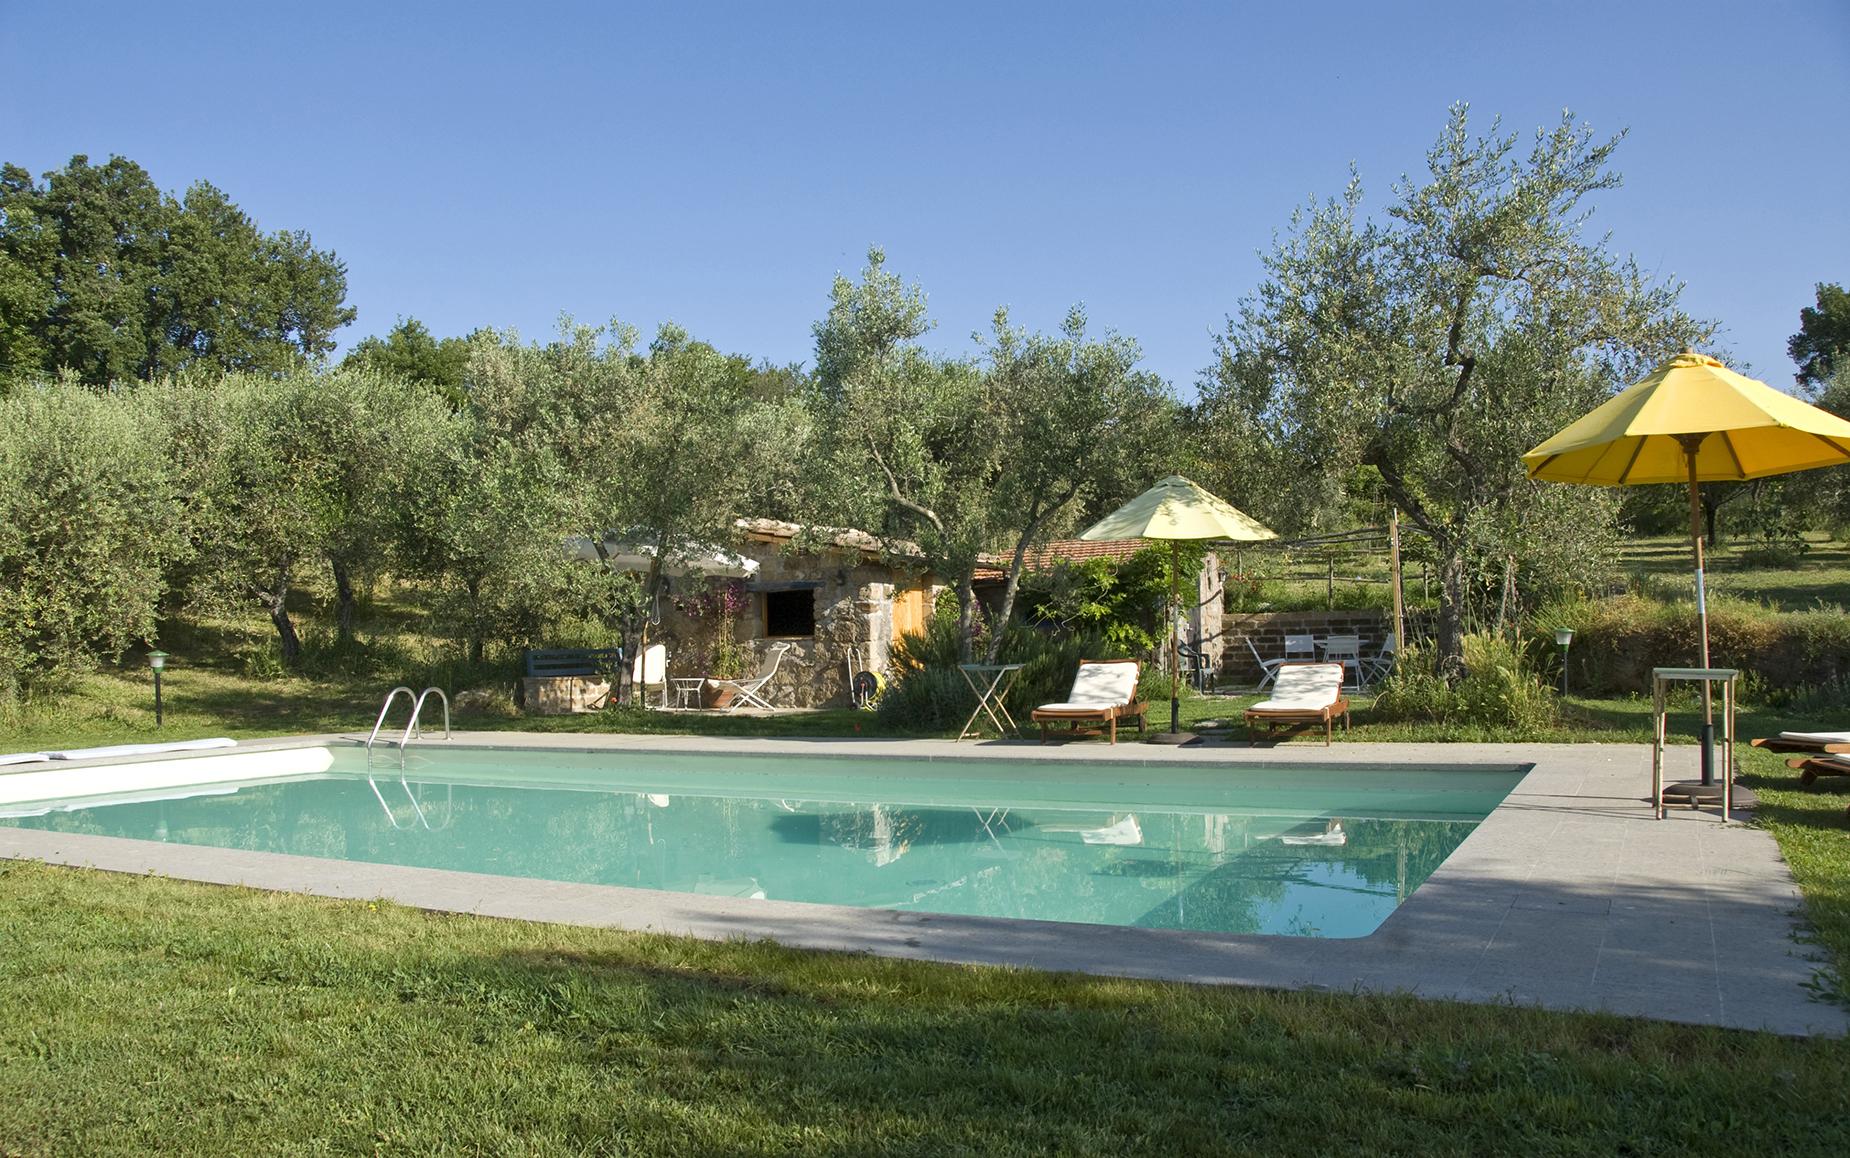 piscina_13417